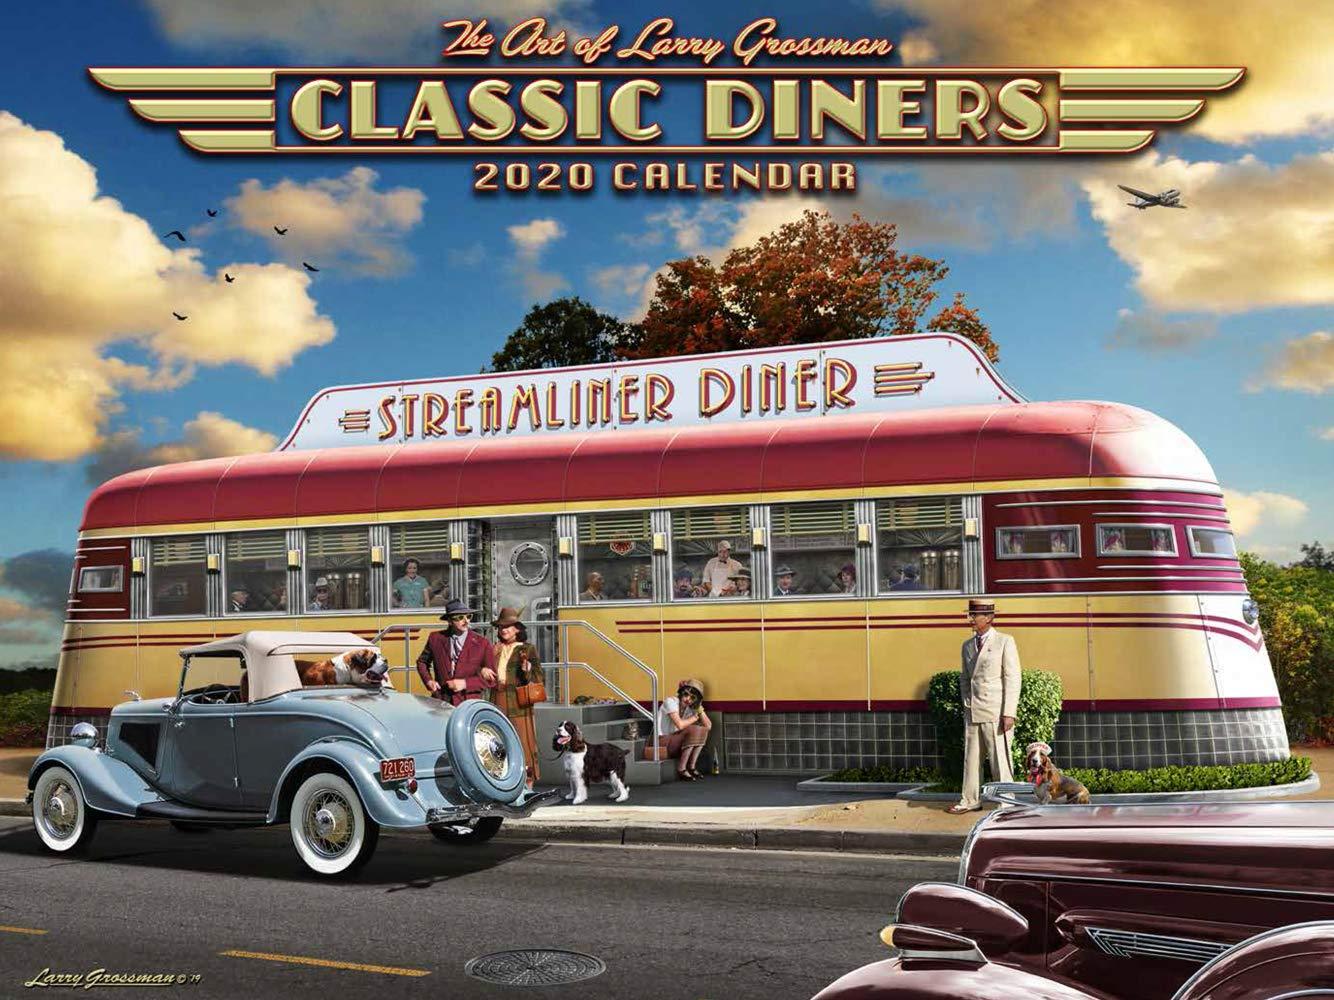 2020 CLASSIC DINERS Art Calendar by Larry Grossman